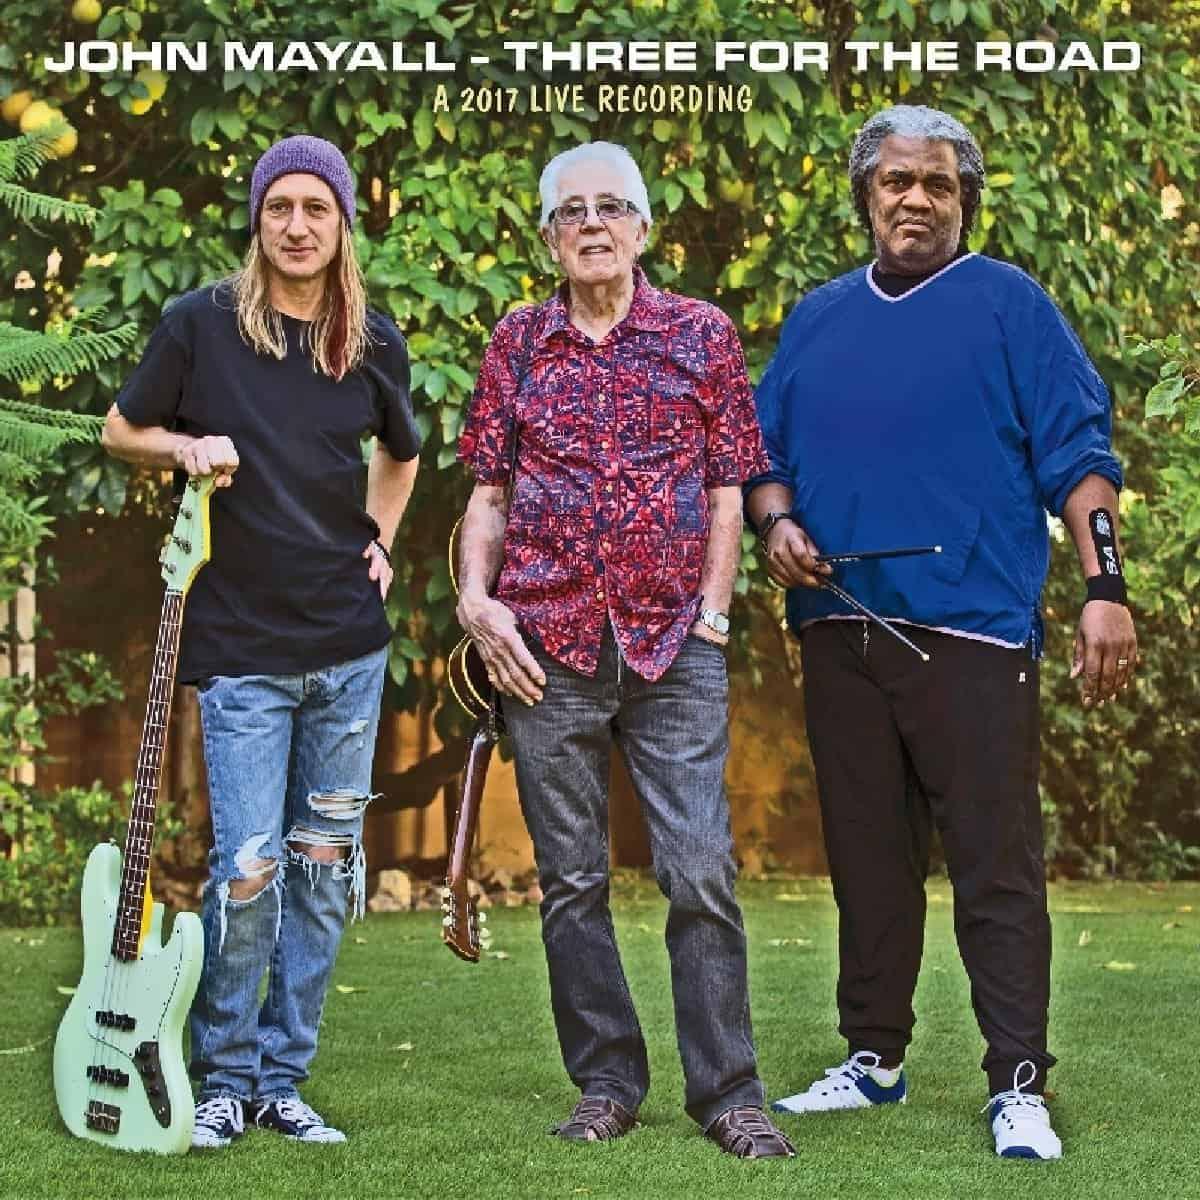 John Mayall Three for the Road